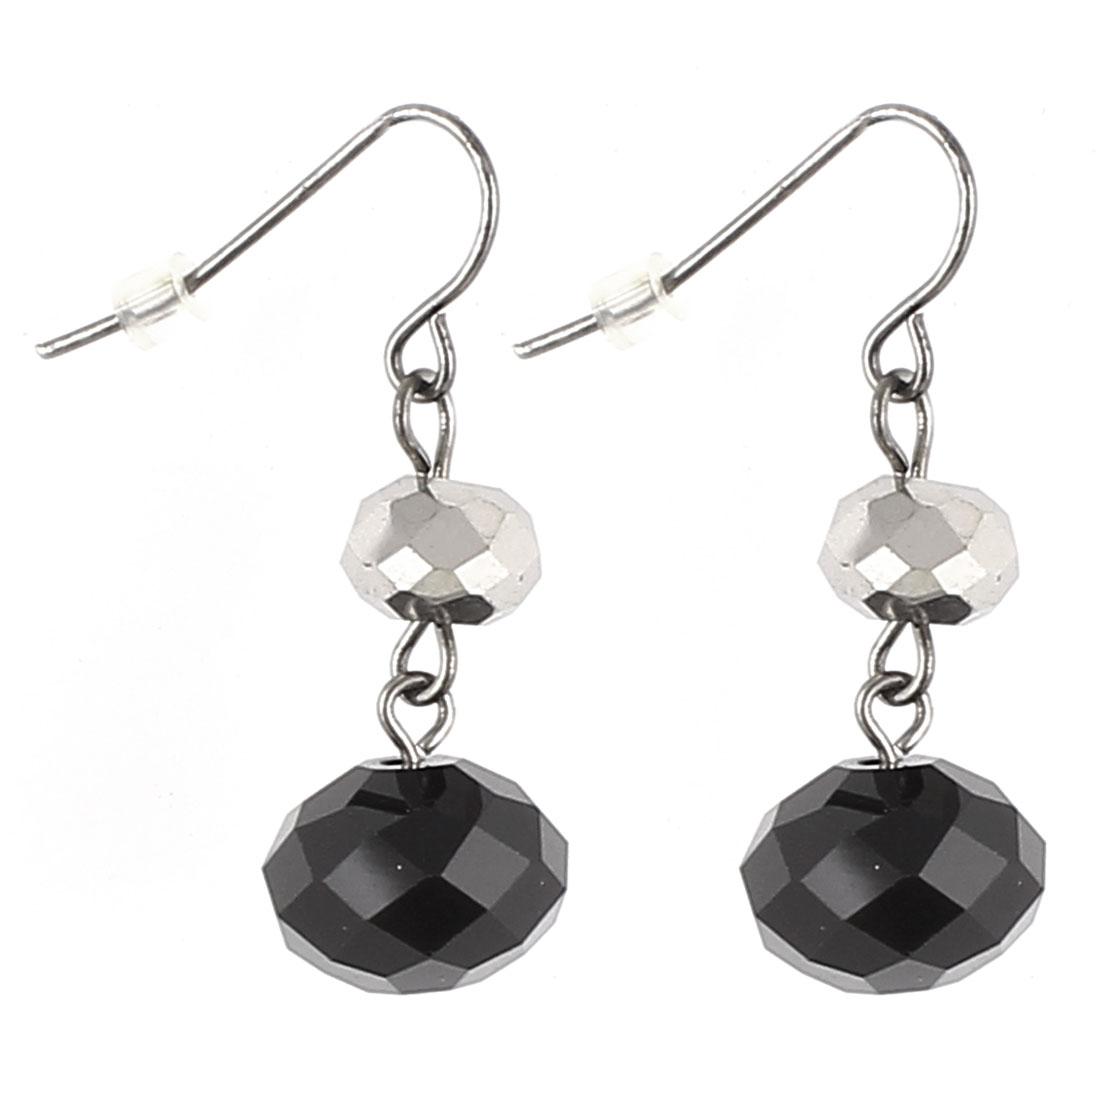 "1.2"" Length Black Plastic Lightweight Beads Pendant Metal Fish Hook Earrings Earbob Eardrop Pair for Lady Women"